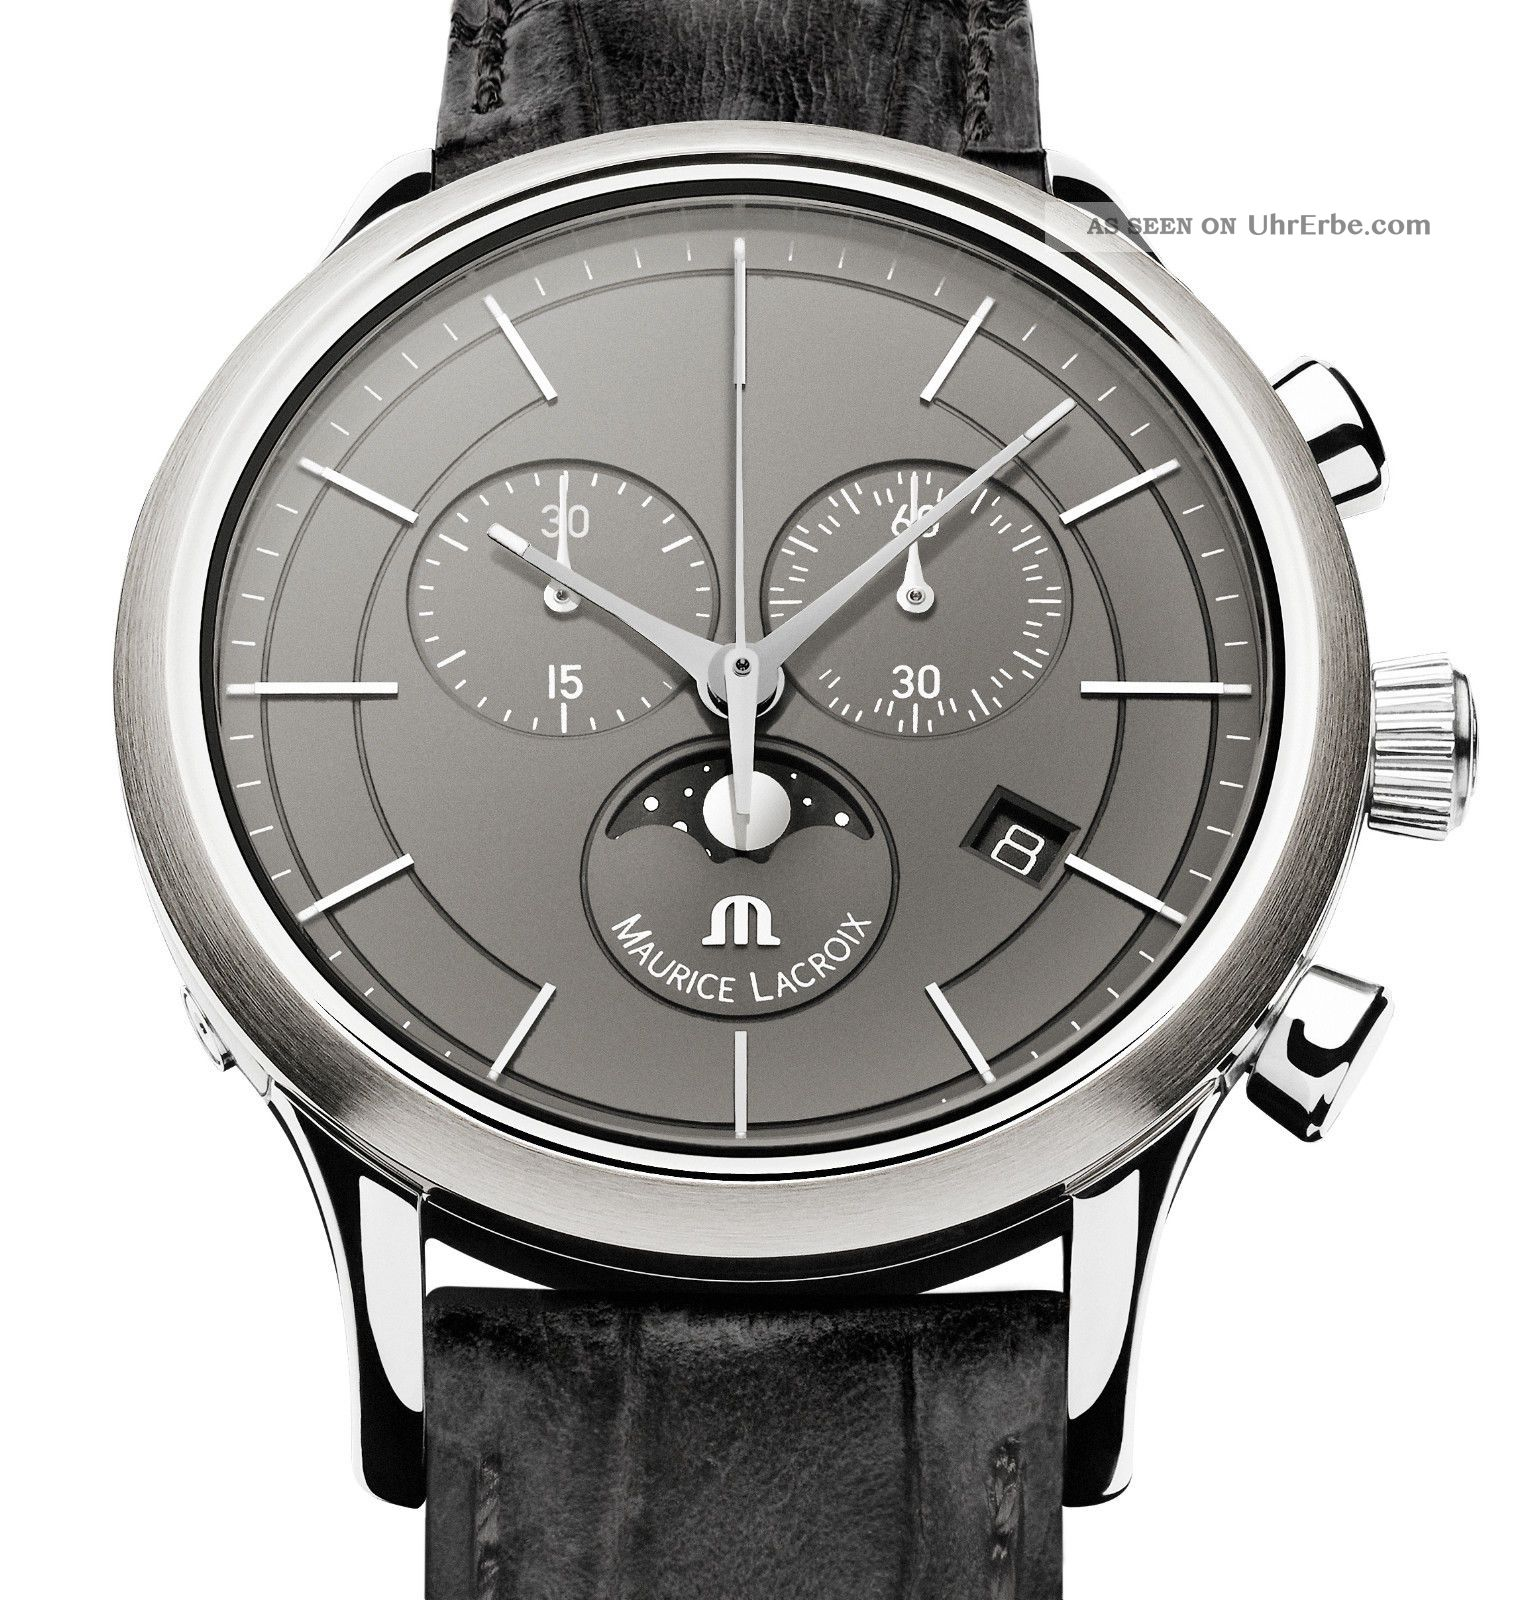 Maurice Lacroix Herrenuhr Mit Mondphase Classic Lc1148 Armbanduhren Bild